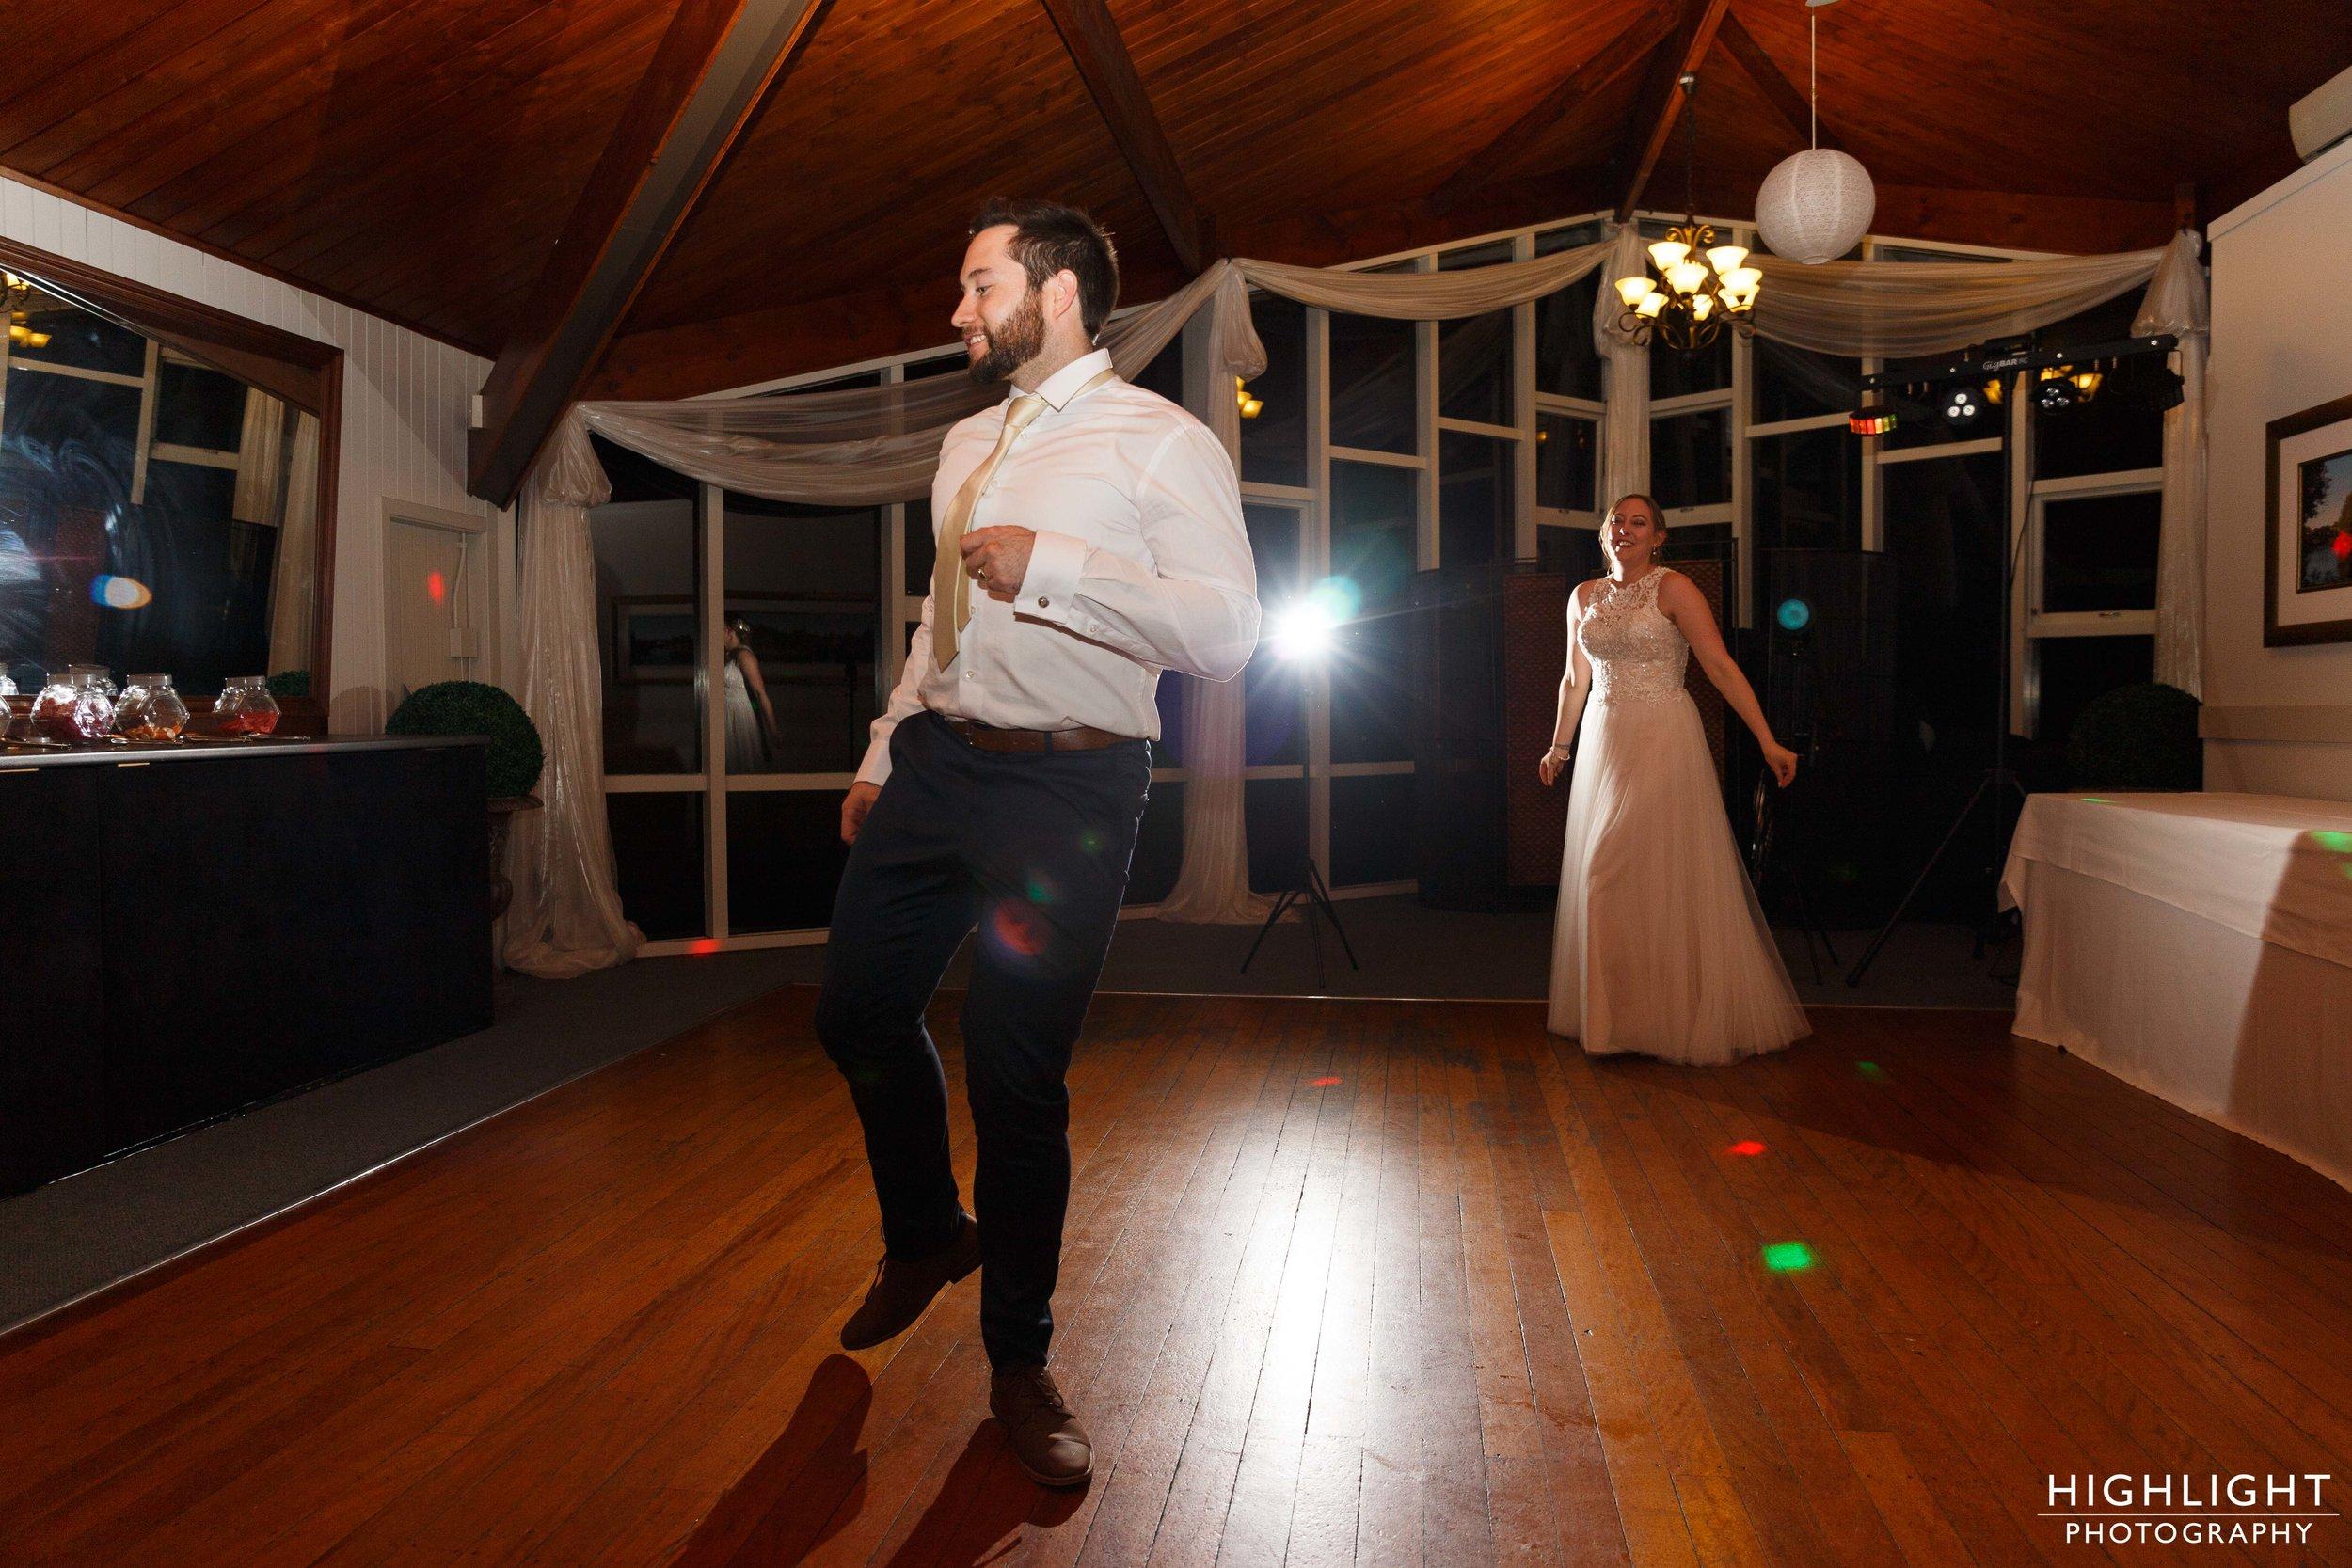 highlight-wedding-photography-palmerston-north-new-zealand-manawatu-chalet-145.jpg